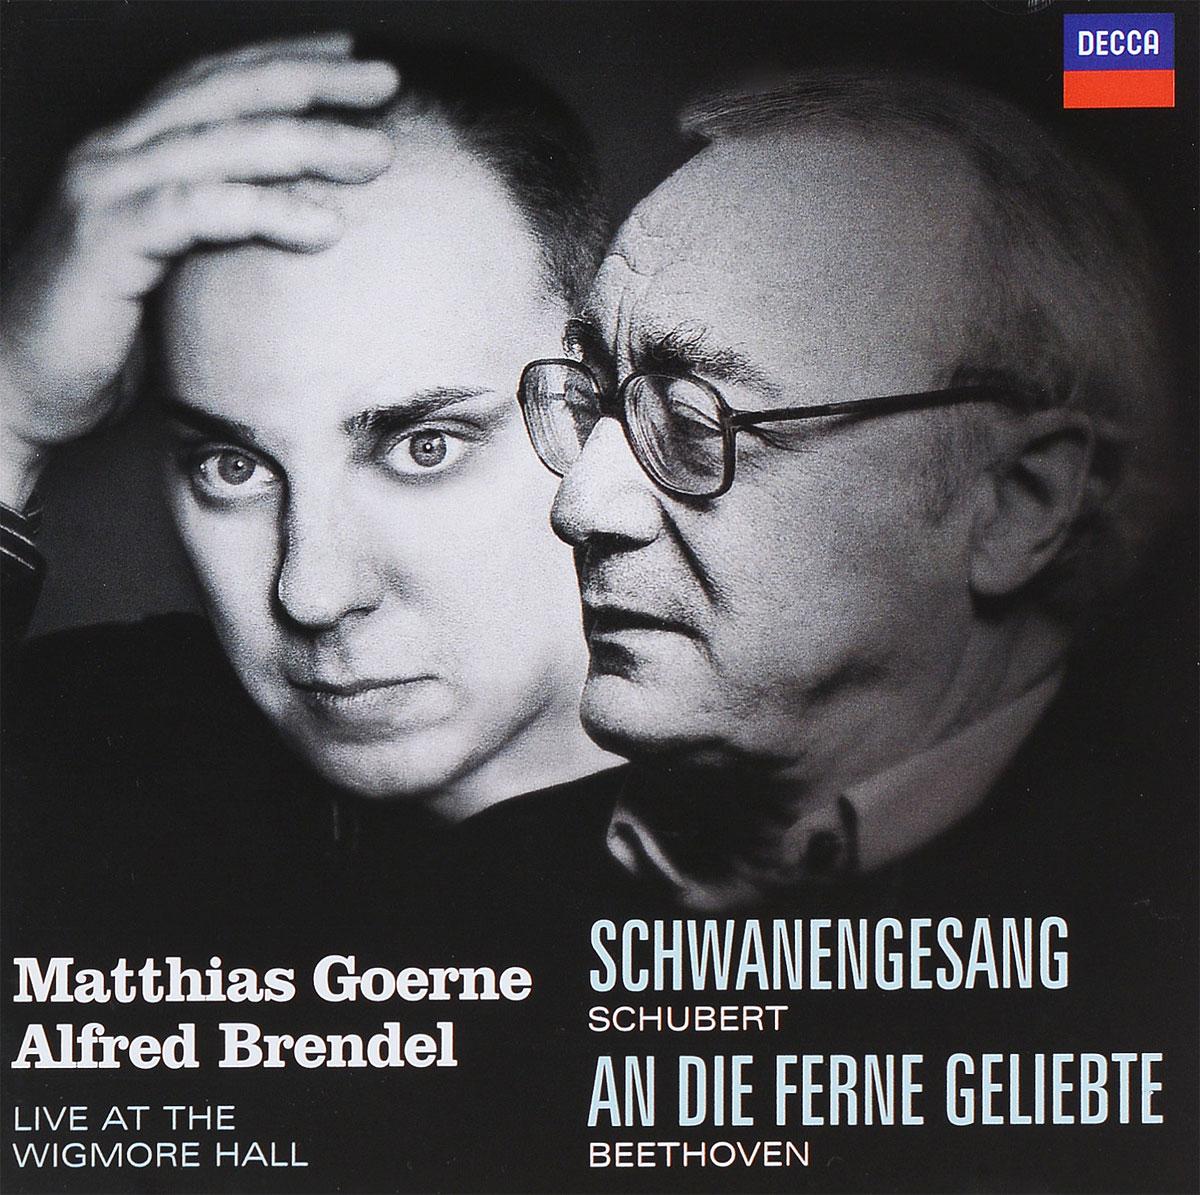 Маттиас Герне Matthias Goerne. Alfred Brendel. Schwanengesang. Schubert. An die Ferne Geliebte. Beethoven (LP)